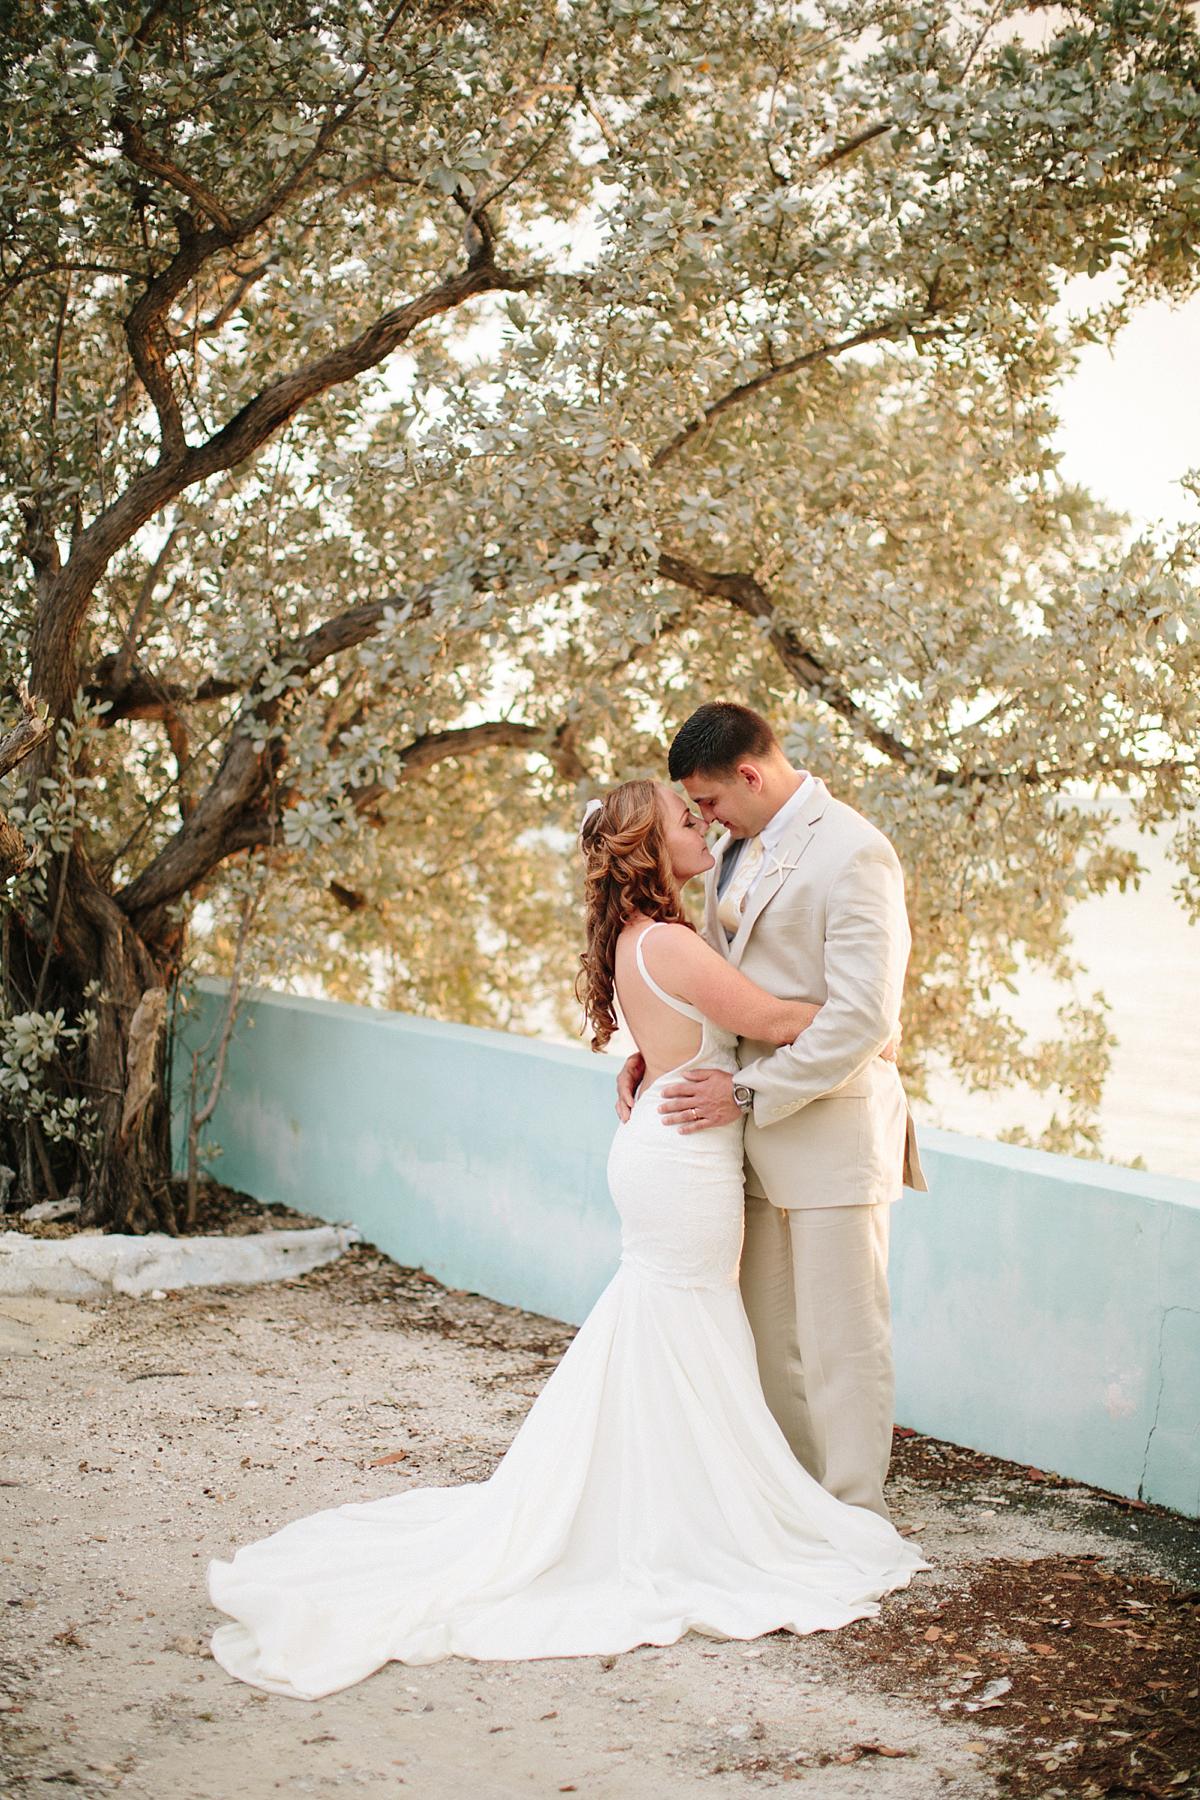 bahamas-destination-wedding-photographer-island-private-ceremony-staniel-cay_0001.jpg